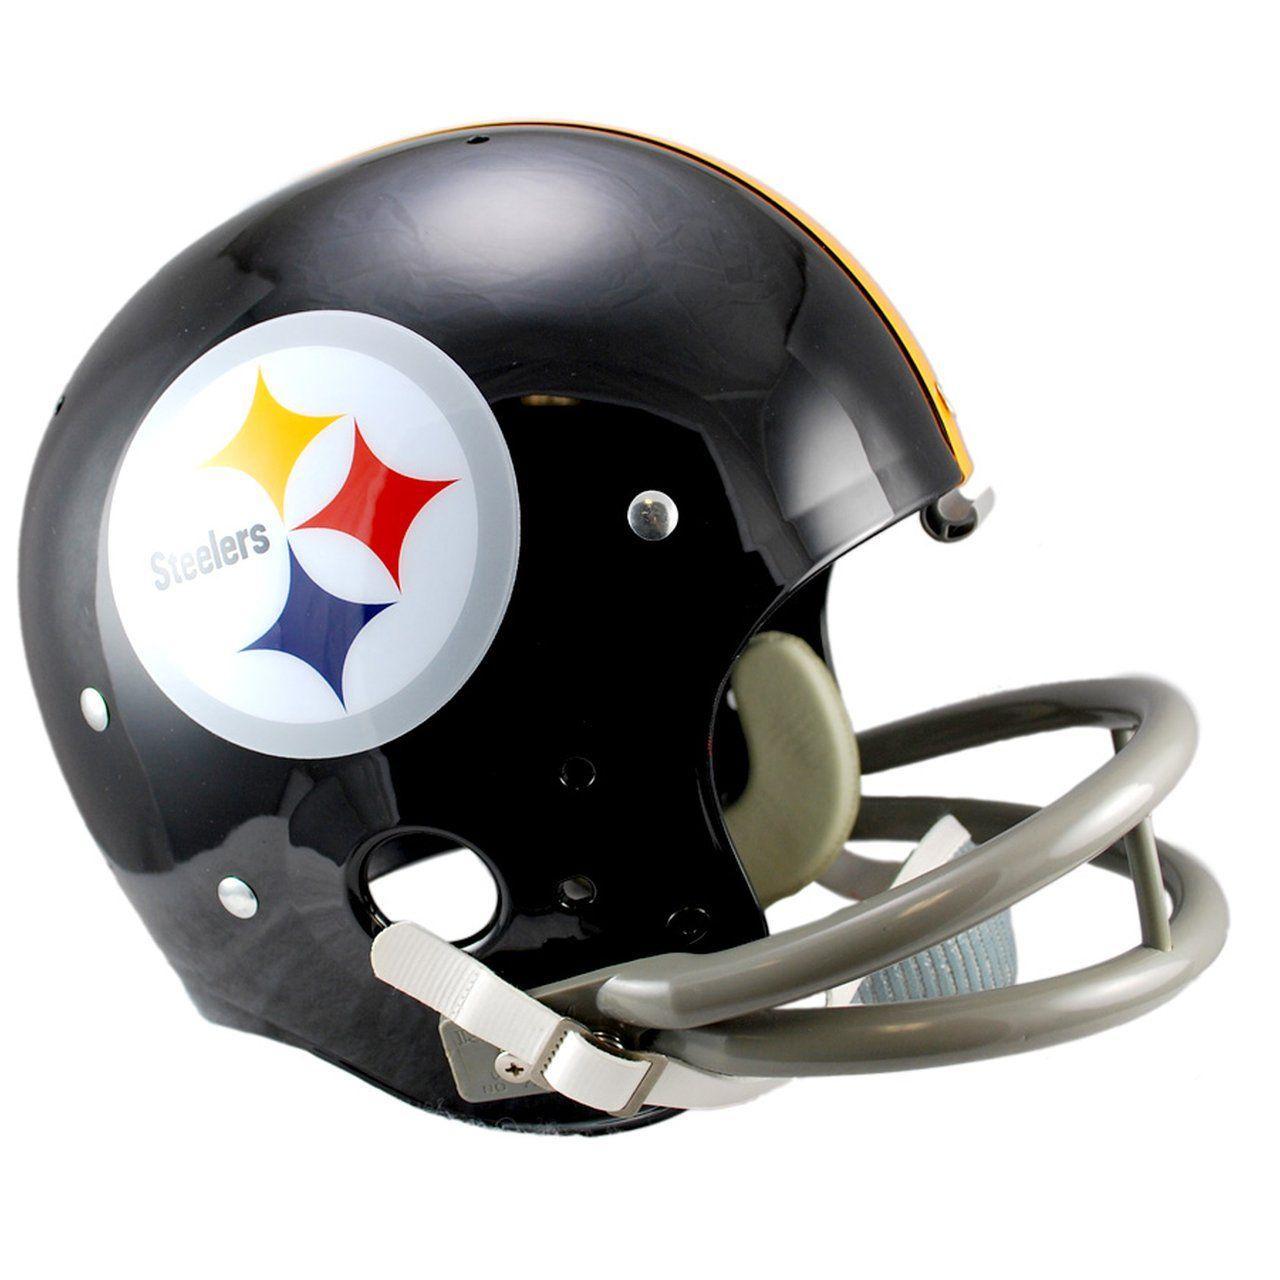 amfoo - Riddell TK Replica Football Helm - Pittsburgh Steelers 63-76